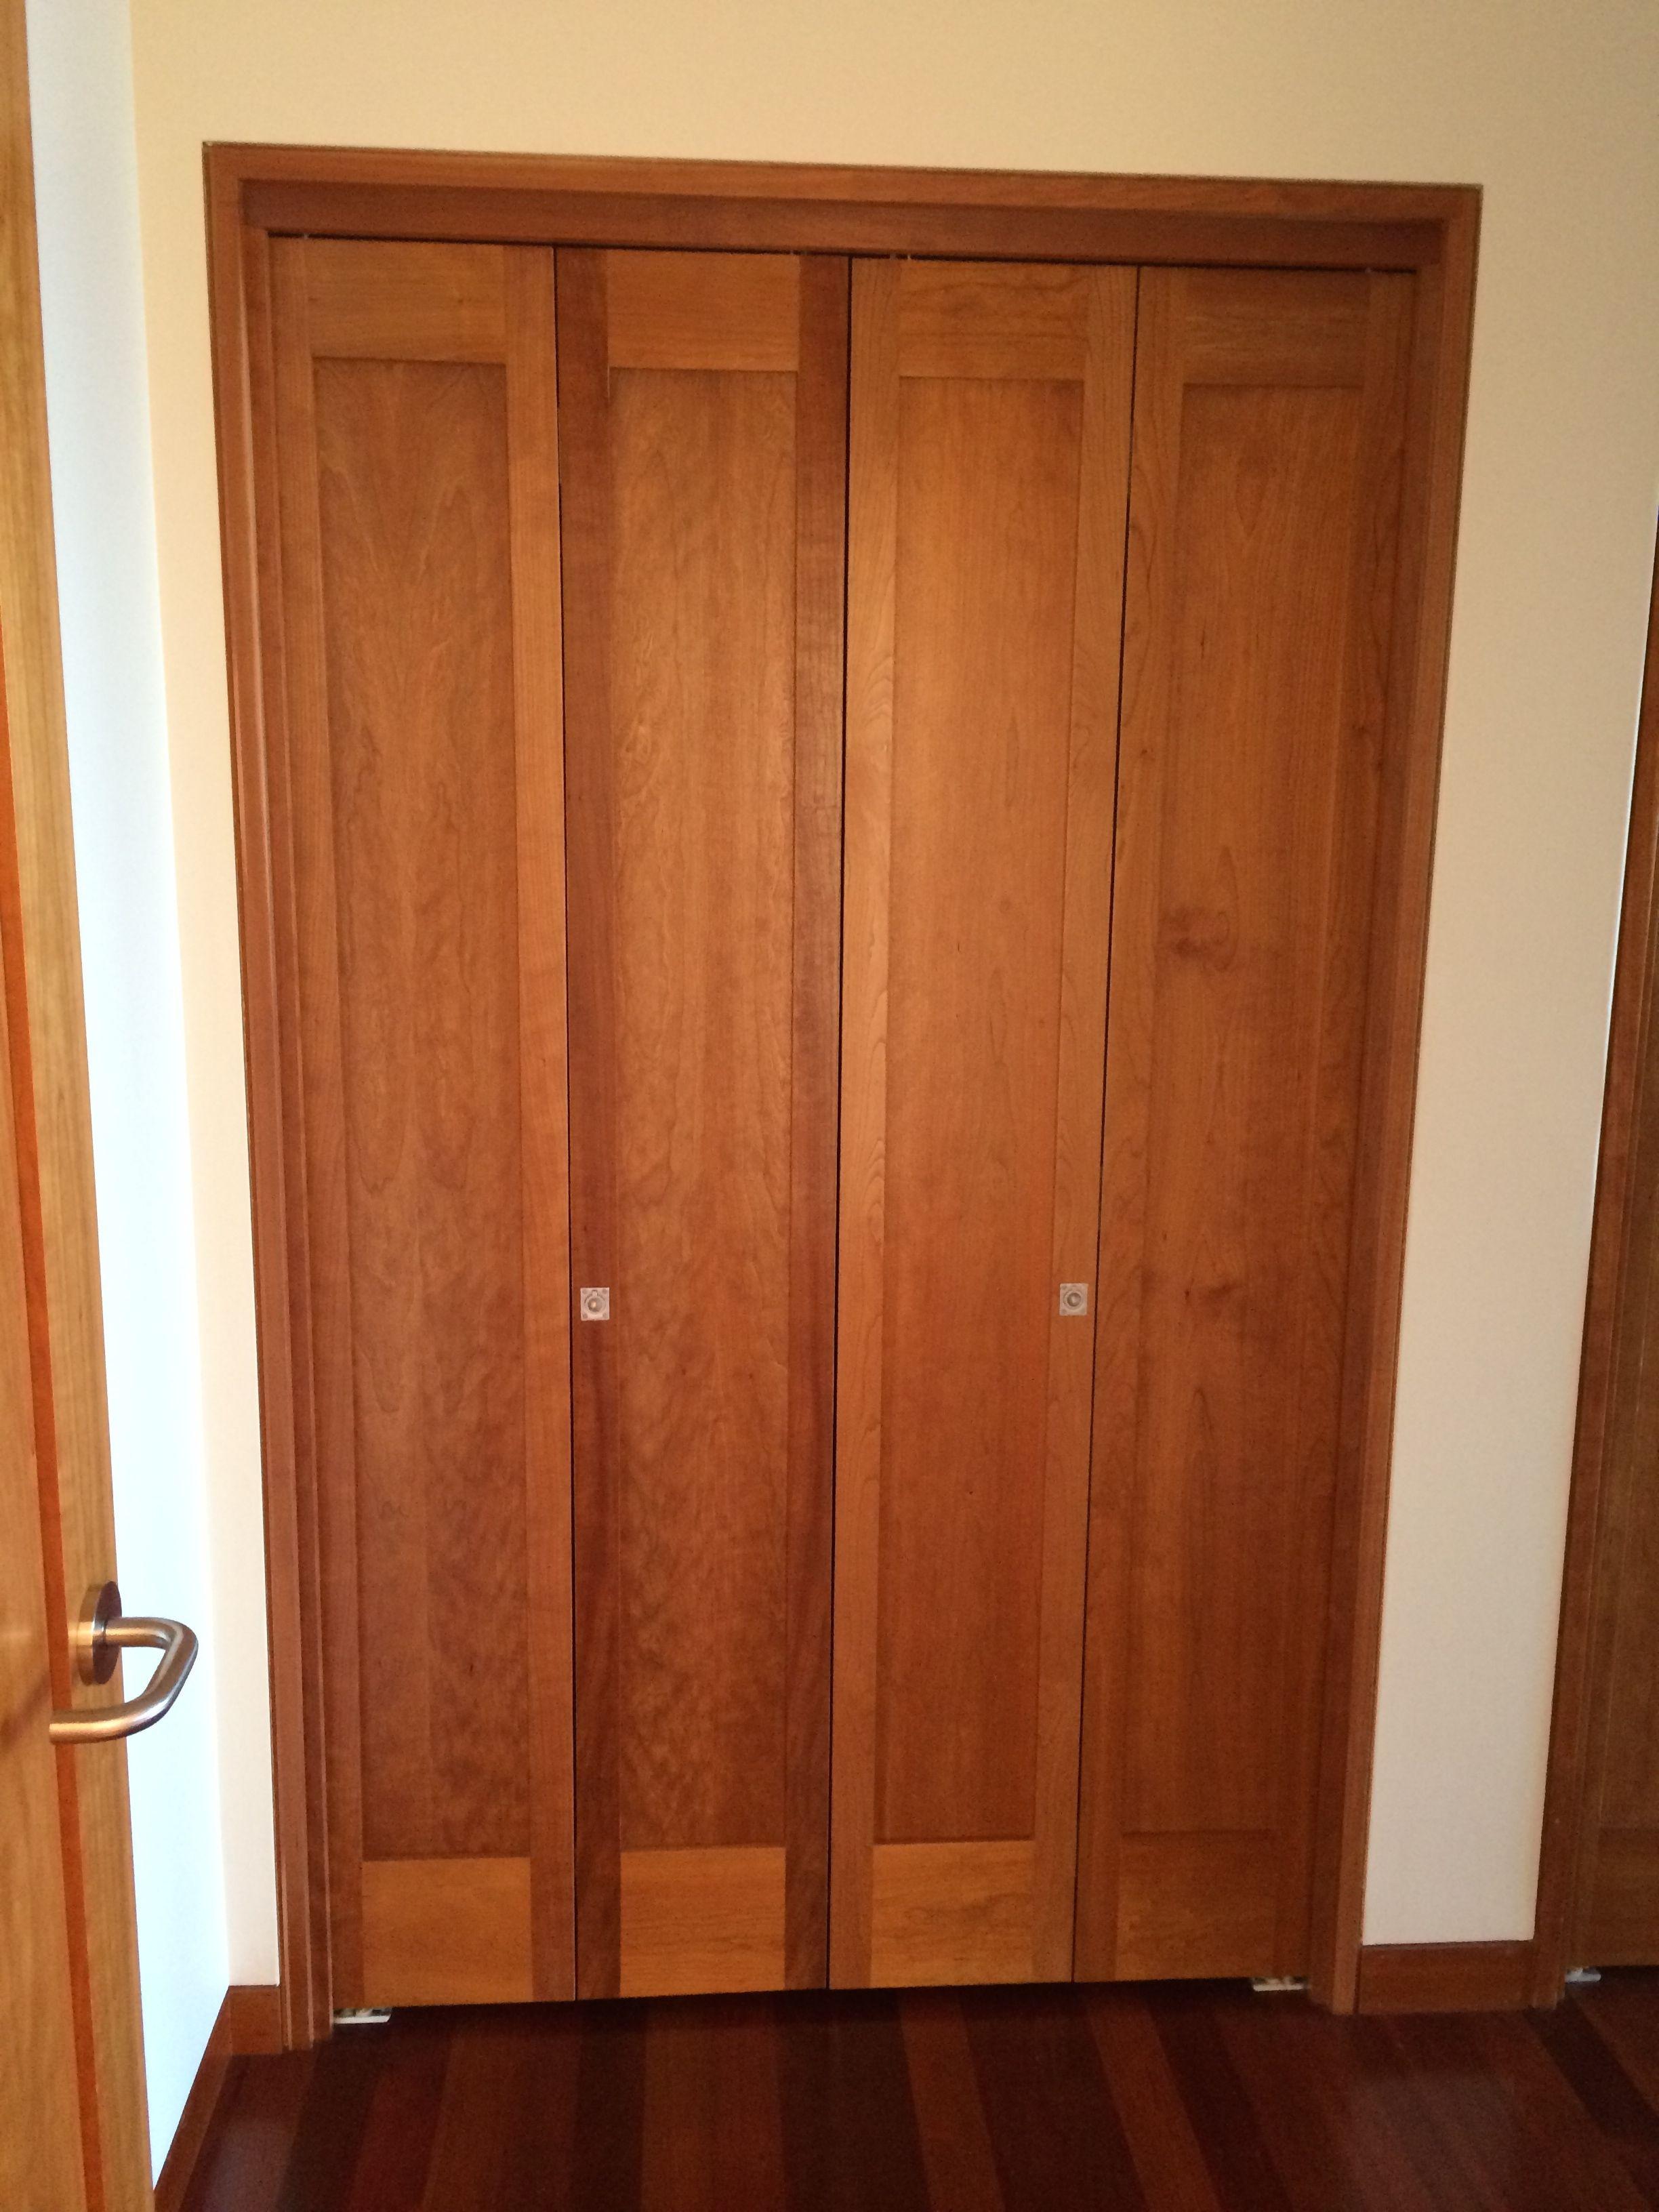 Cherry Wood Bifold Closet Doors